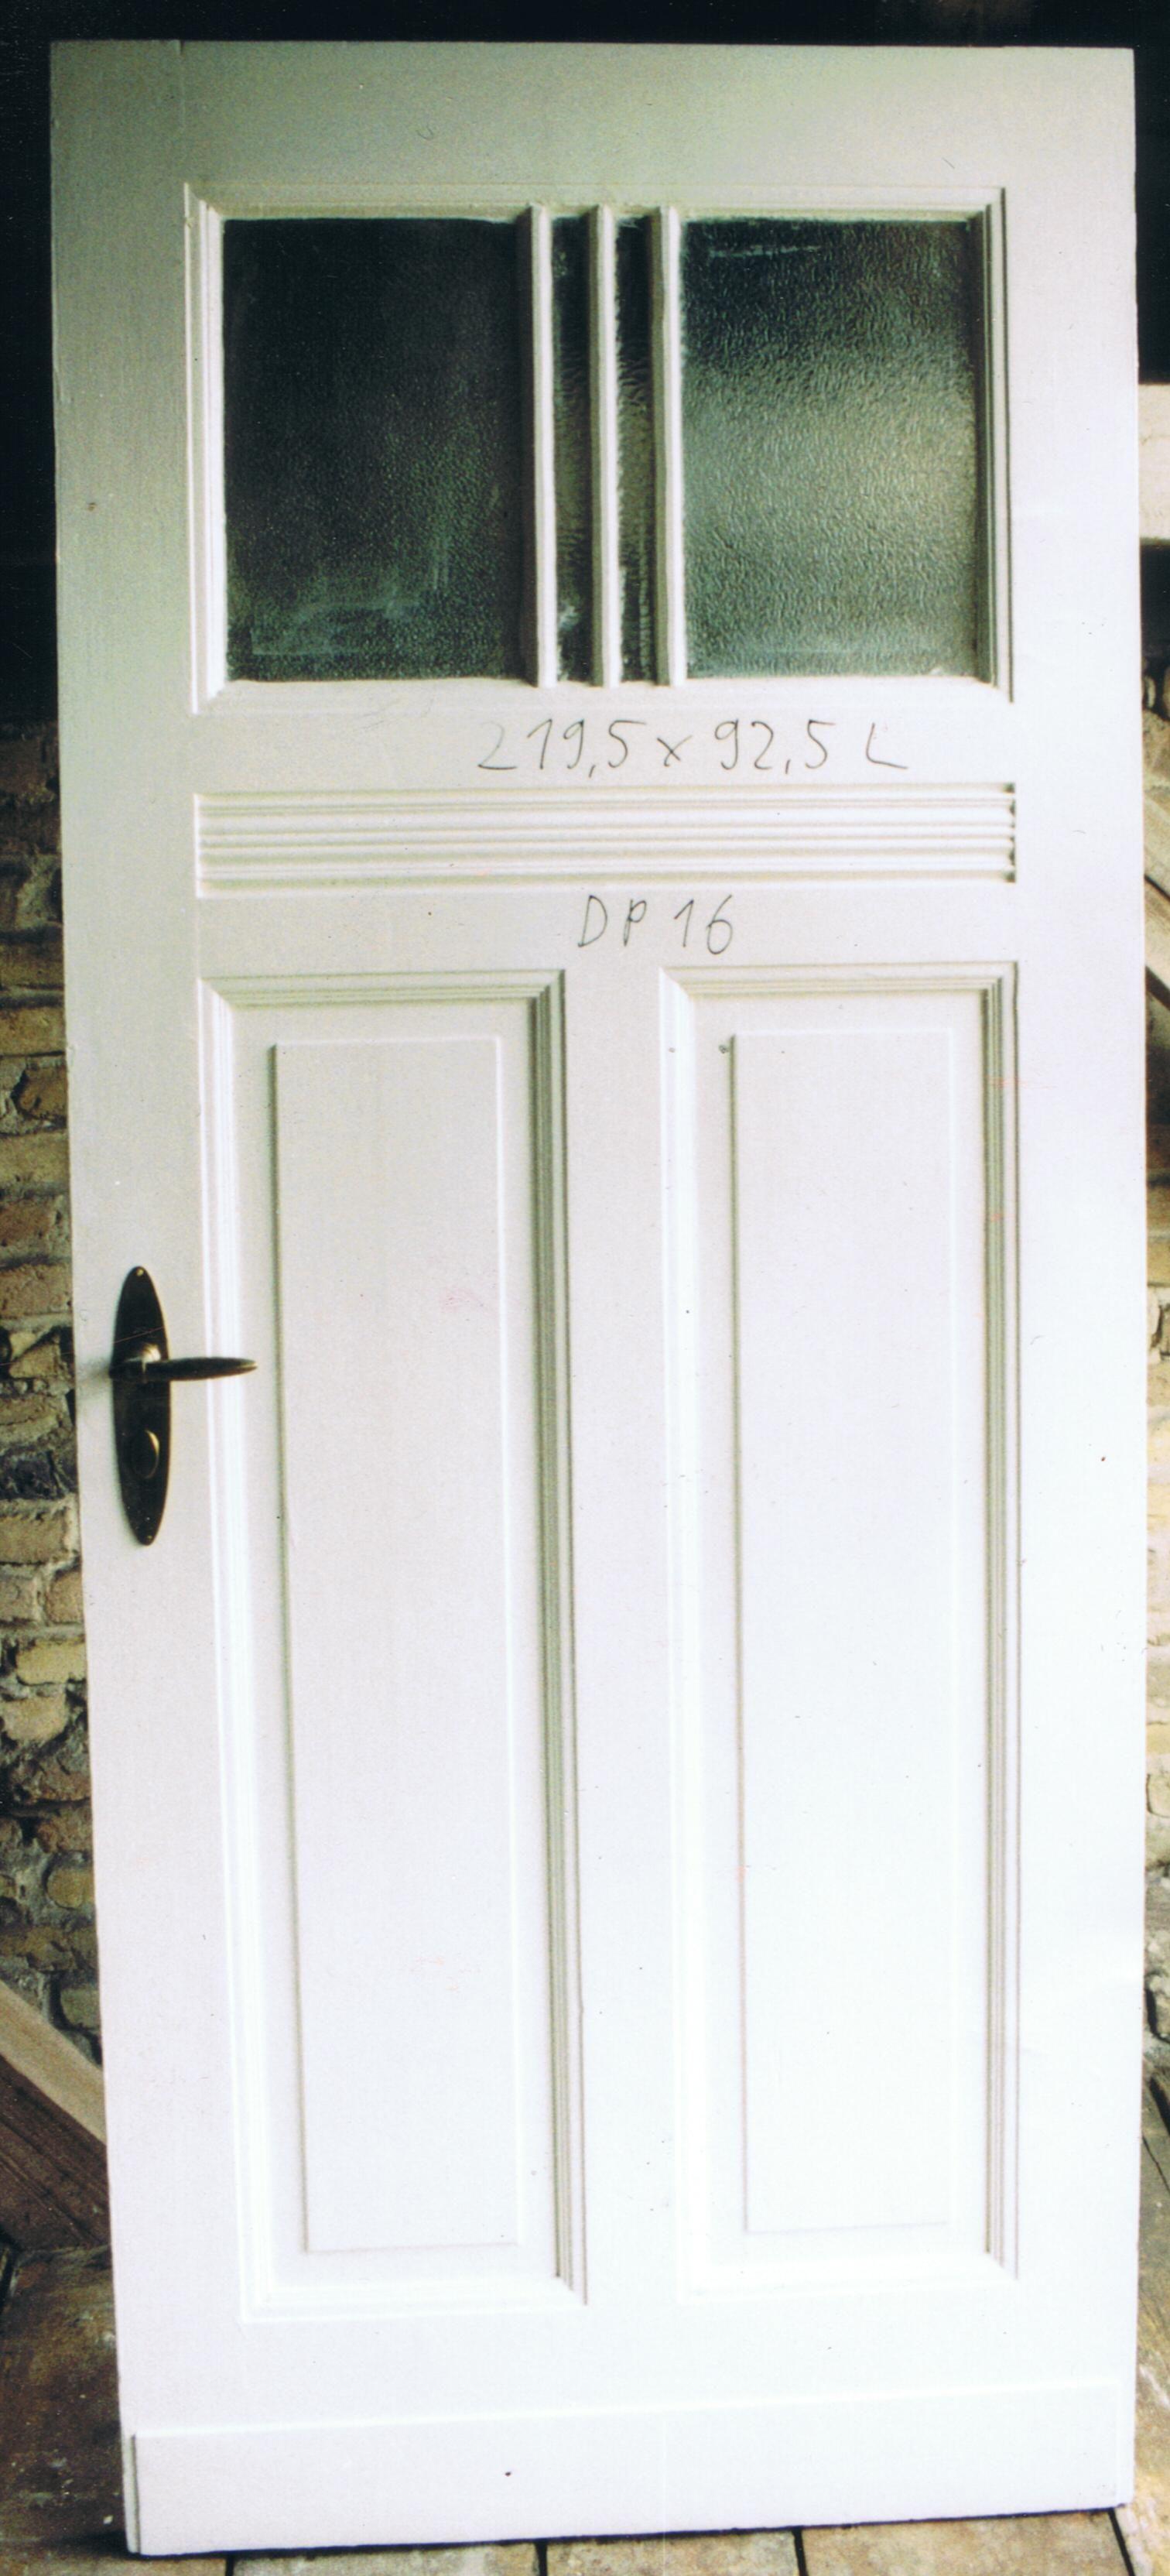 Altberliner Türen altberliner bauelemente historische antike zimmertüren jugendstil